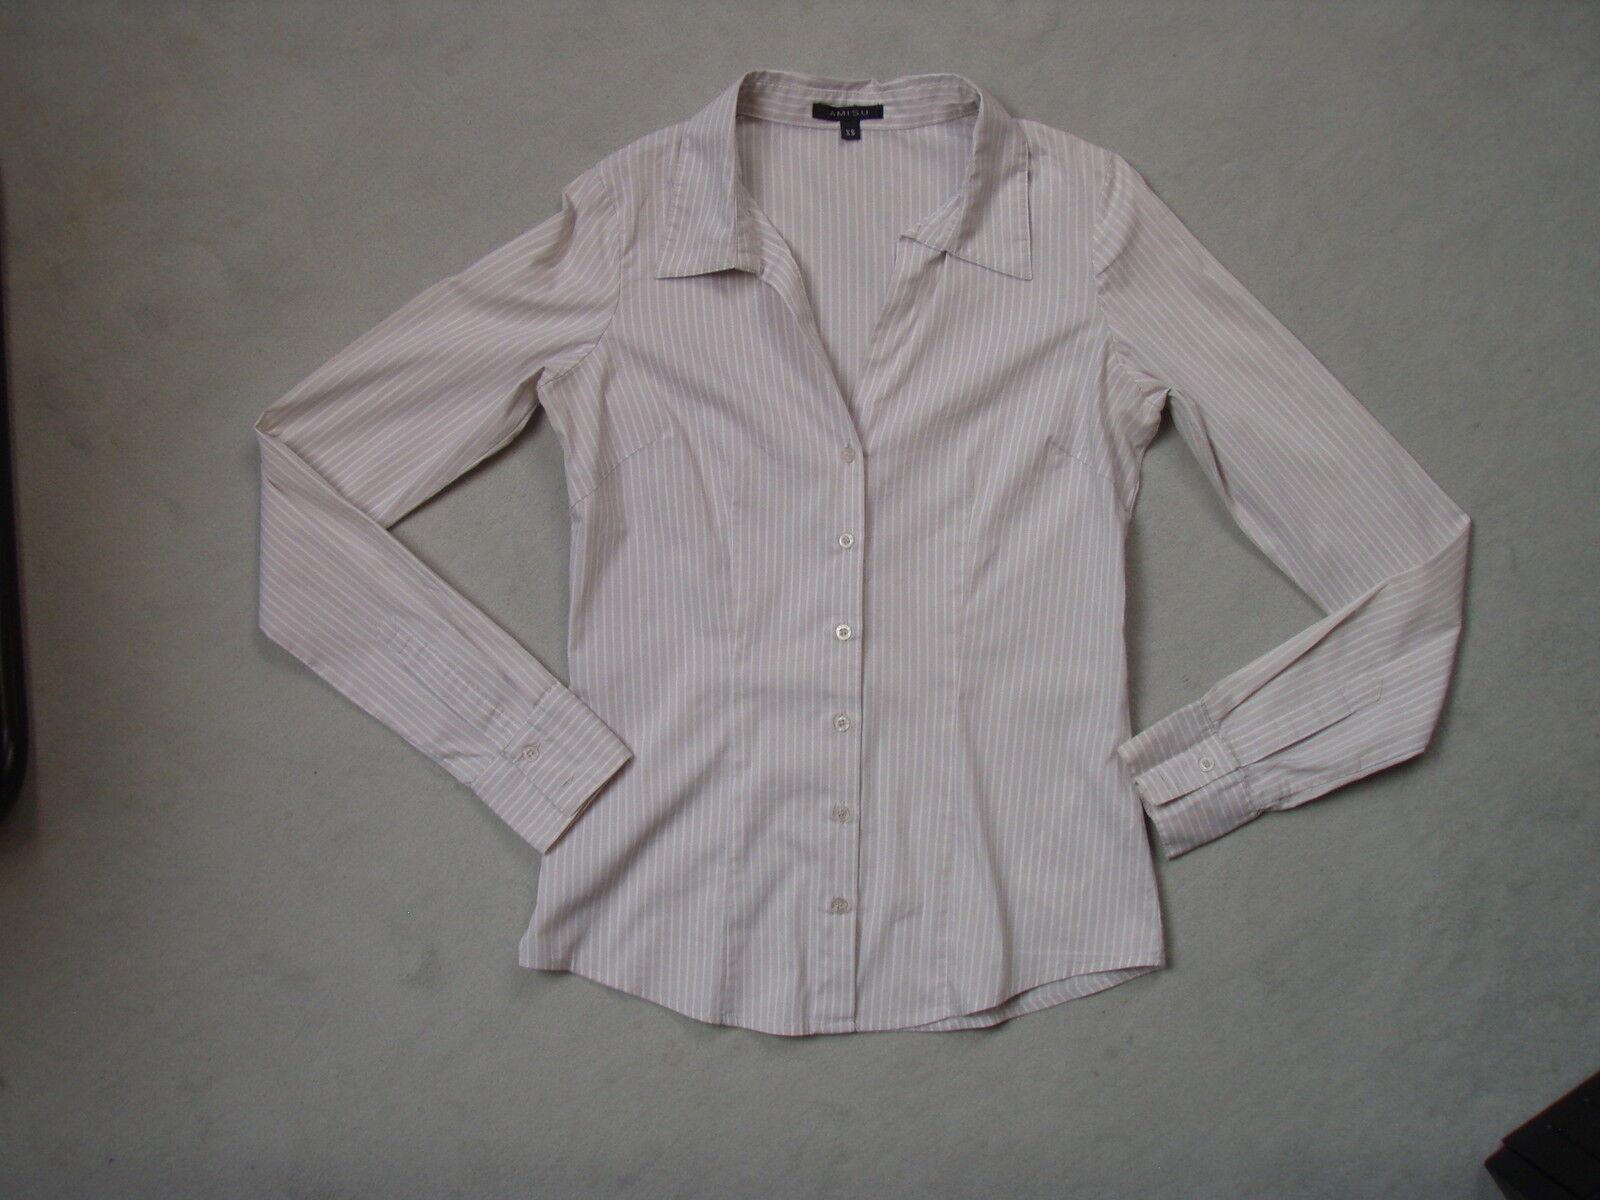 AMISU - Damen Langarm Bluse - Gr. XS bzw. 34 -  mit weiß